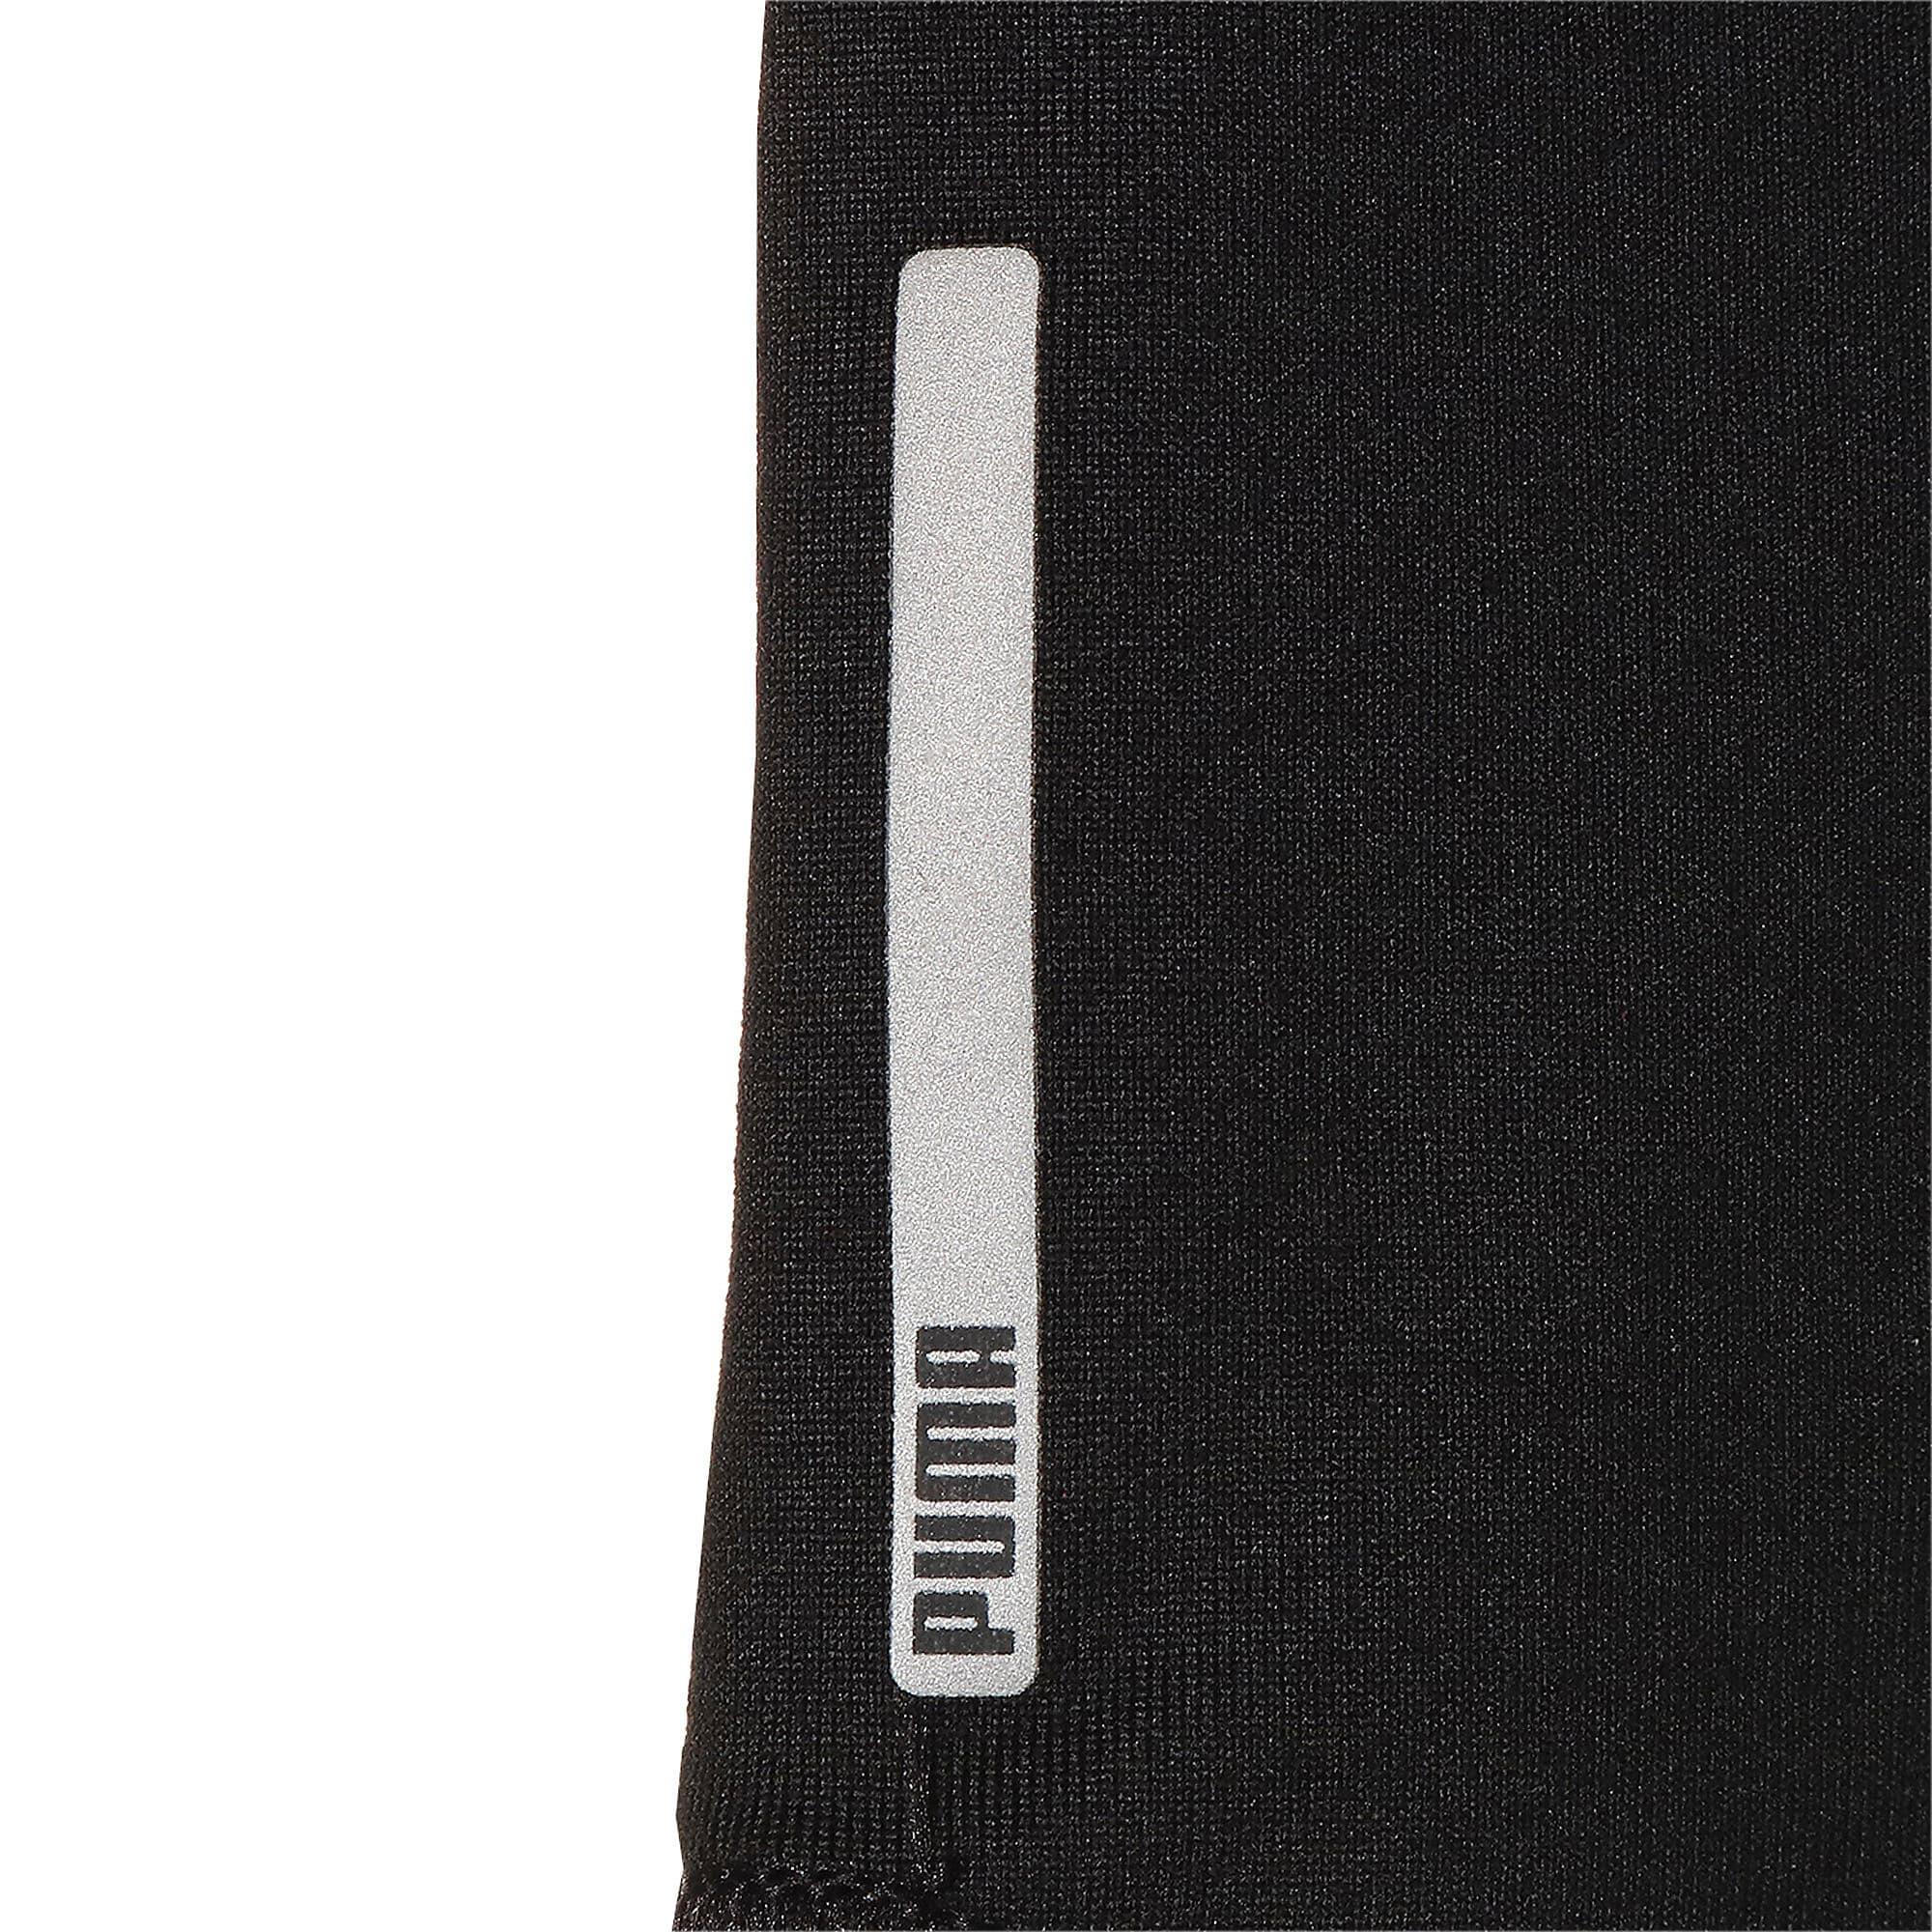 Thumbnail 10 of スタジオ SS メッシュ ウィメンズ トレーニング Tシャツ 半袖, Puma Black, medium-JPN